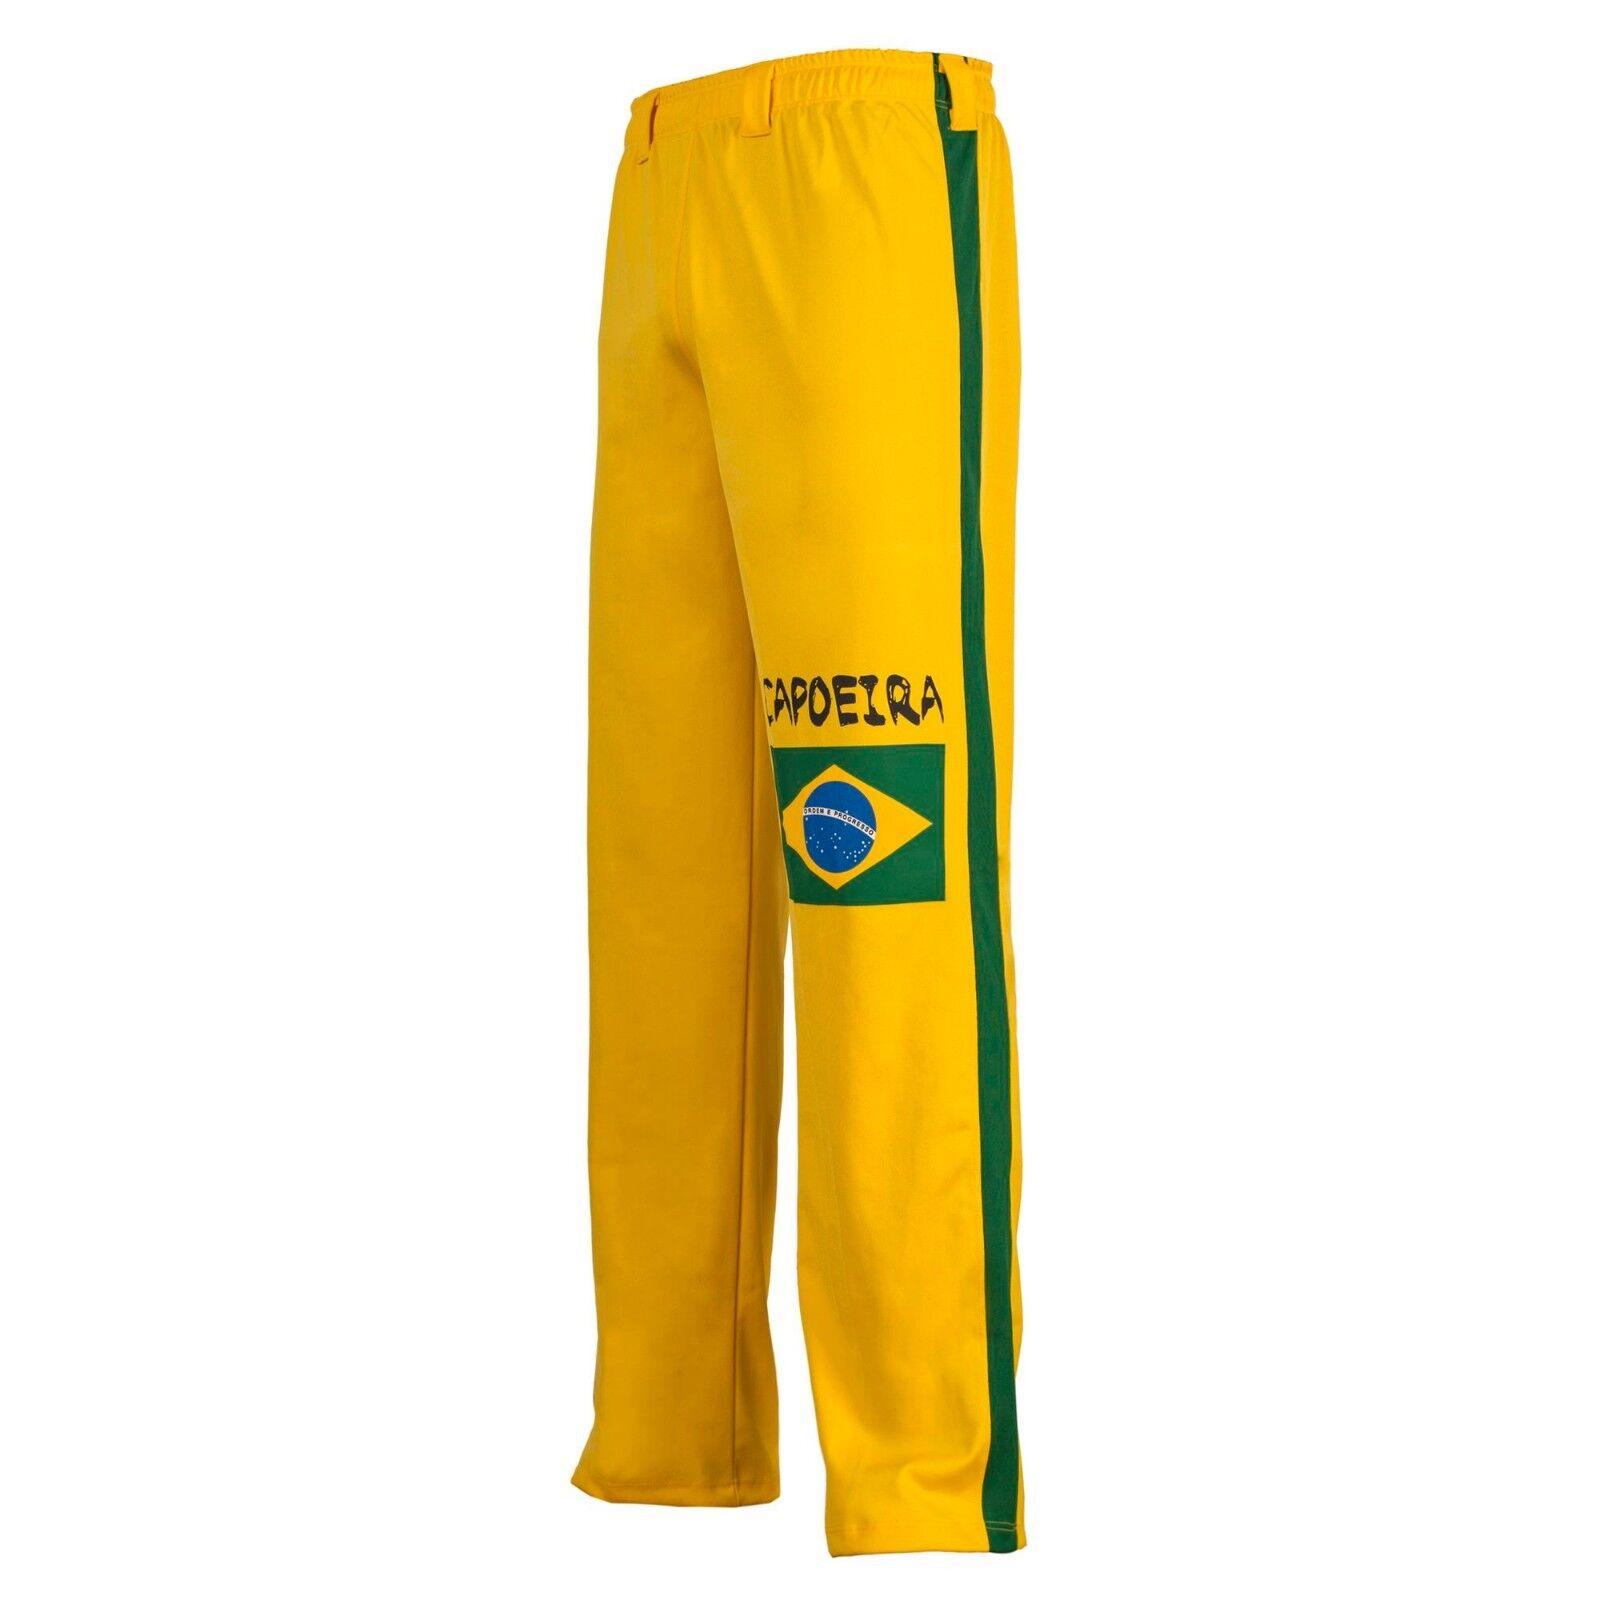 Unisex Brazil Flag Green Yellow Capoeira Martial Arts Sport Cord Trousers Pants